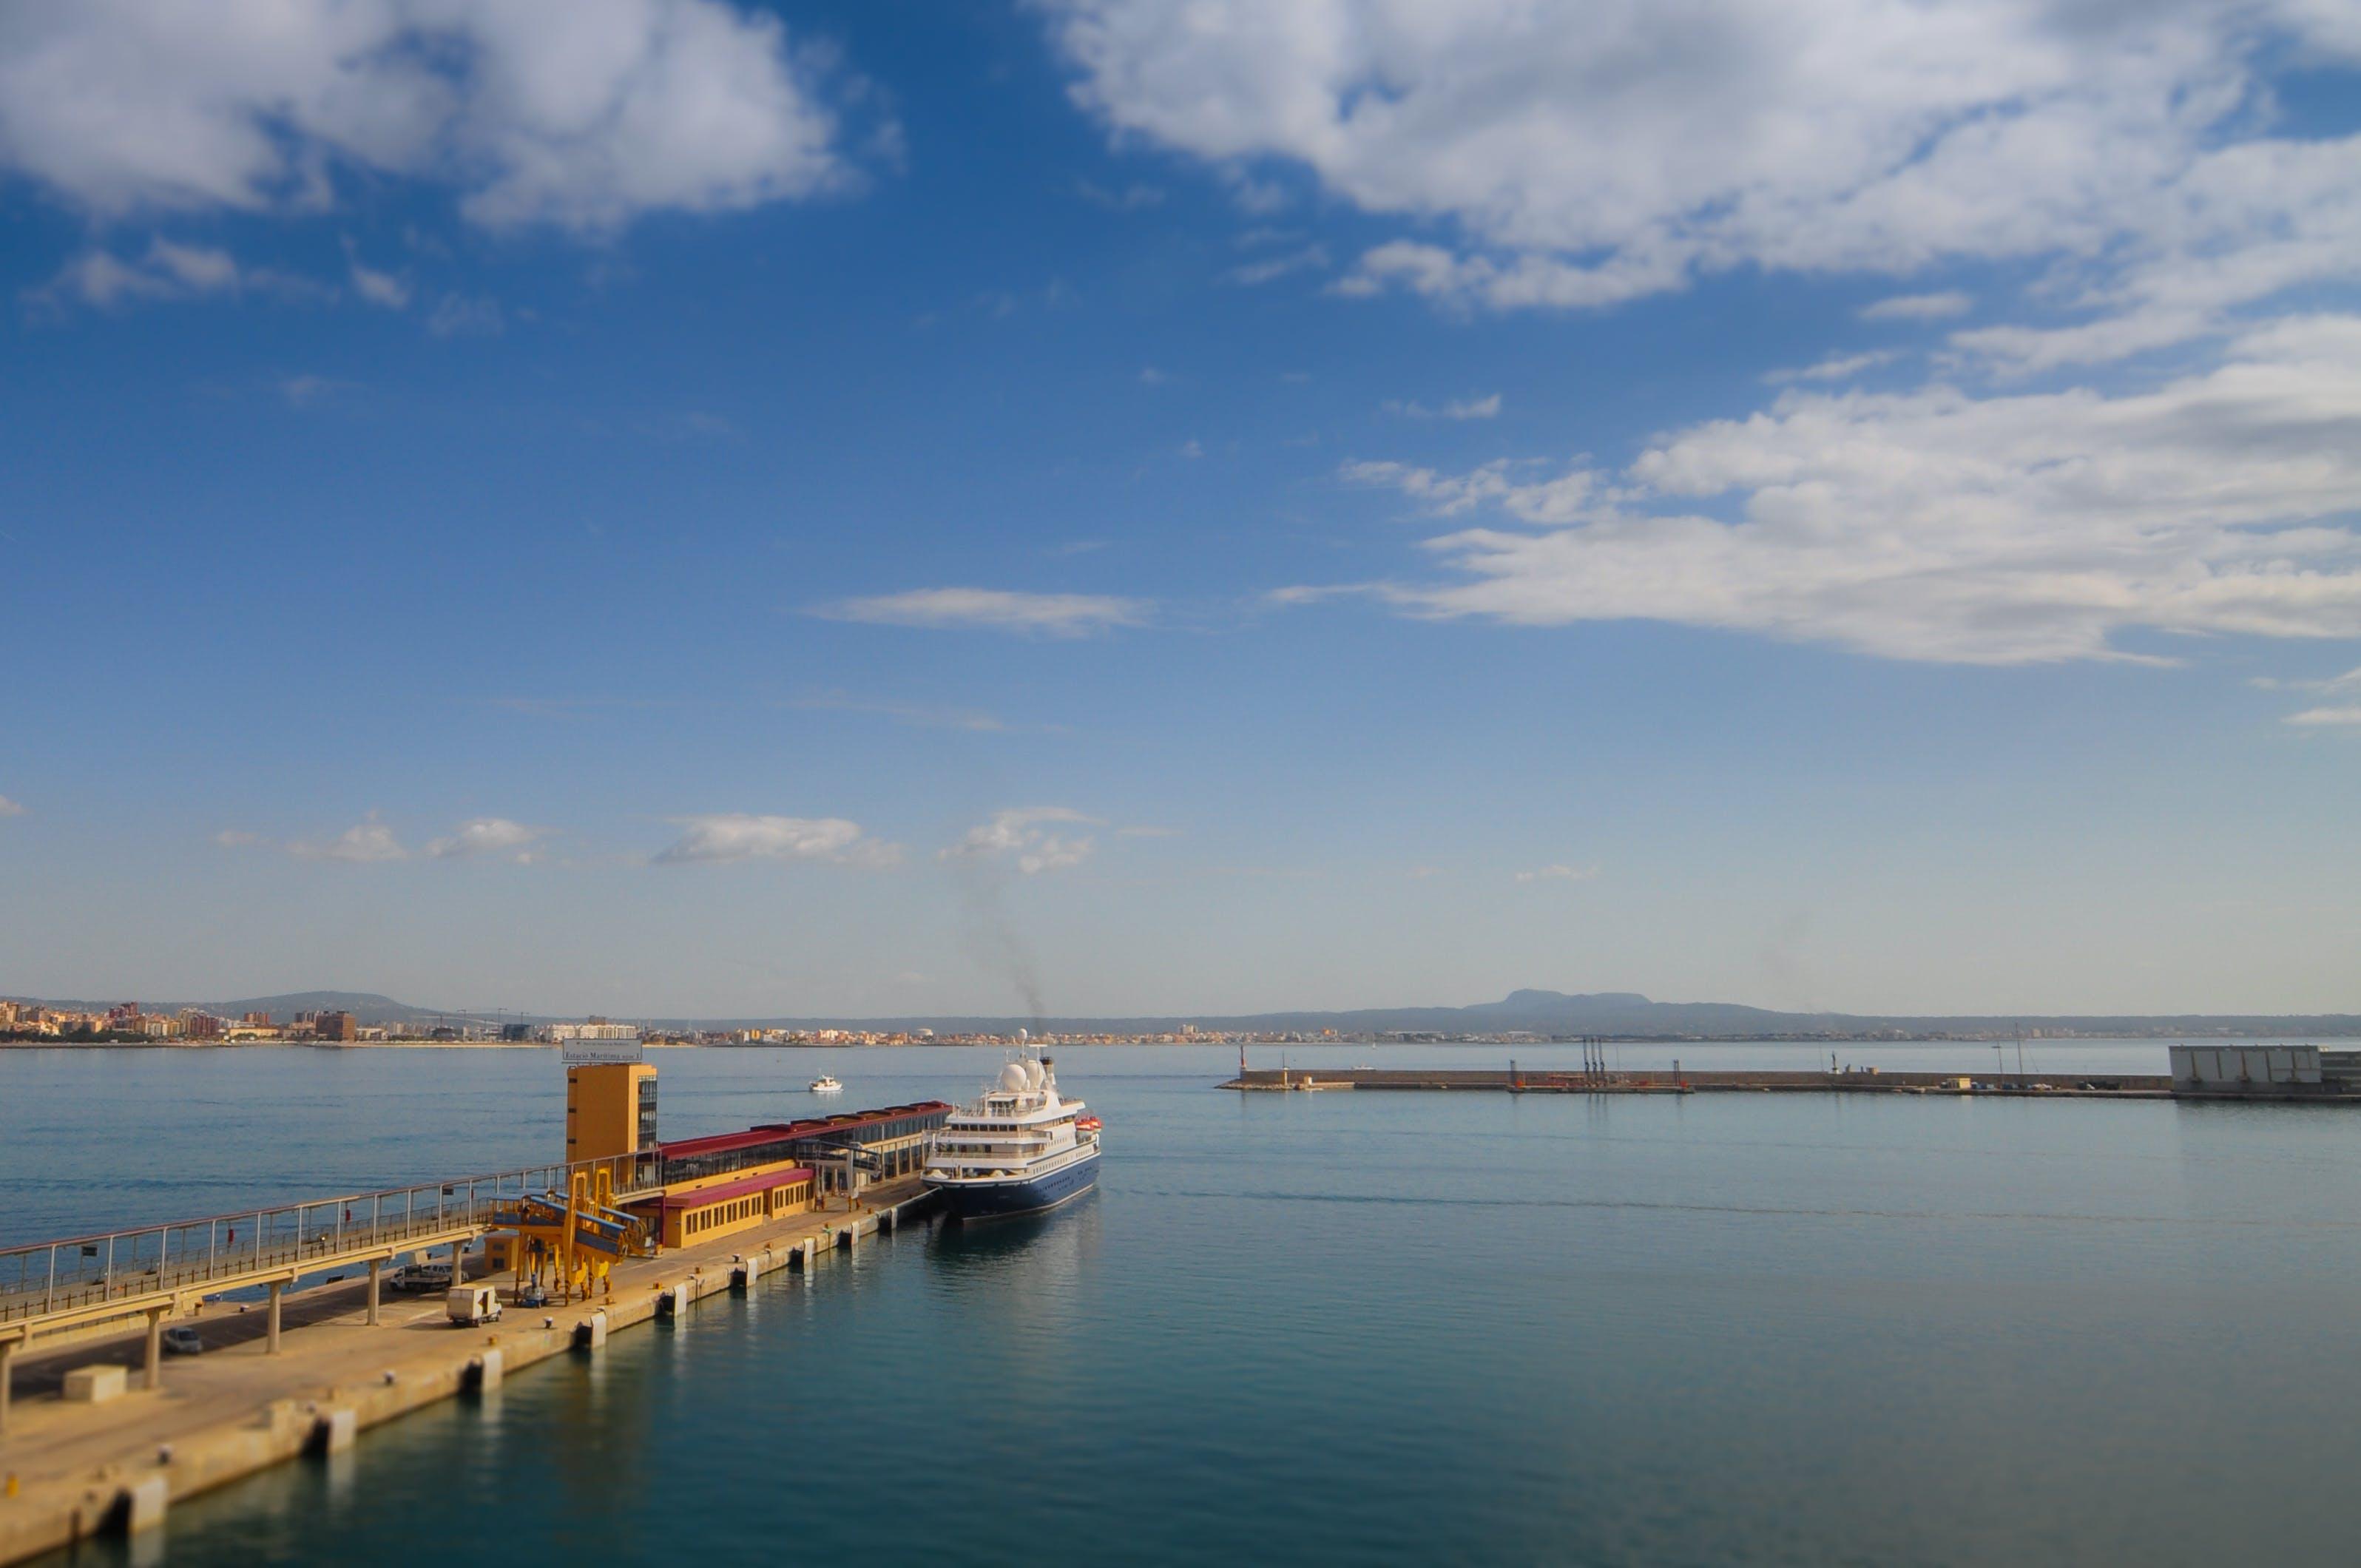 White Cruise Ship Beside Dock